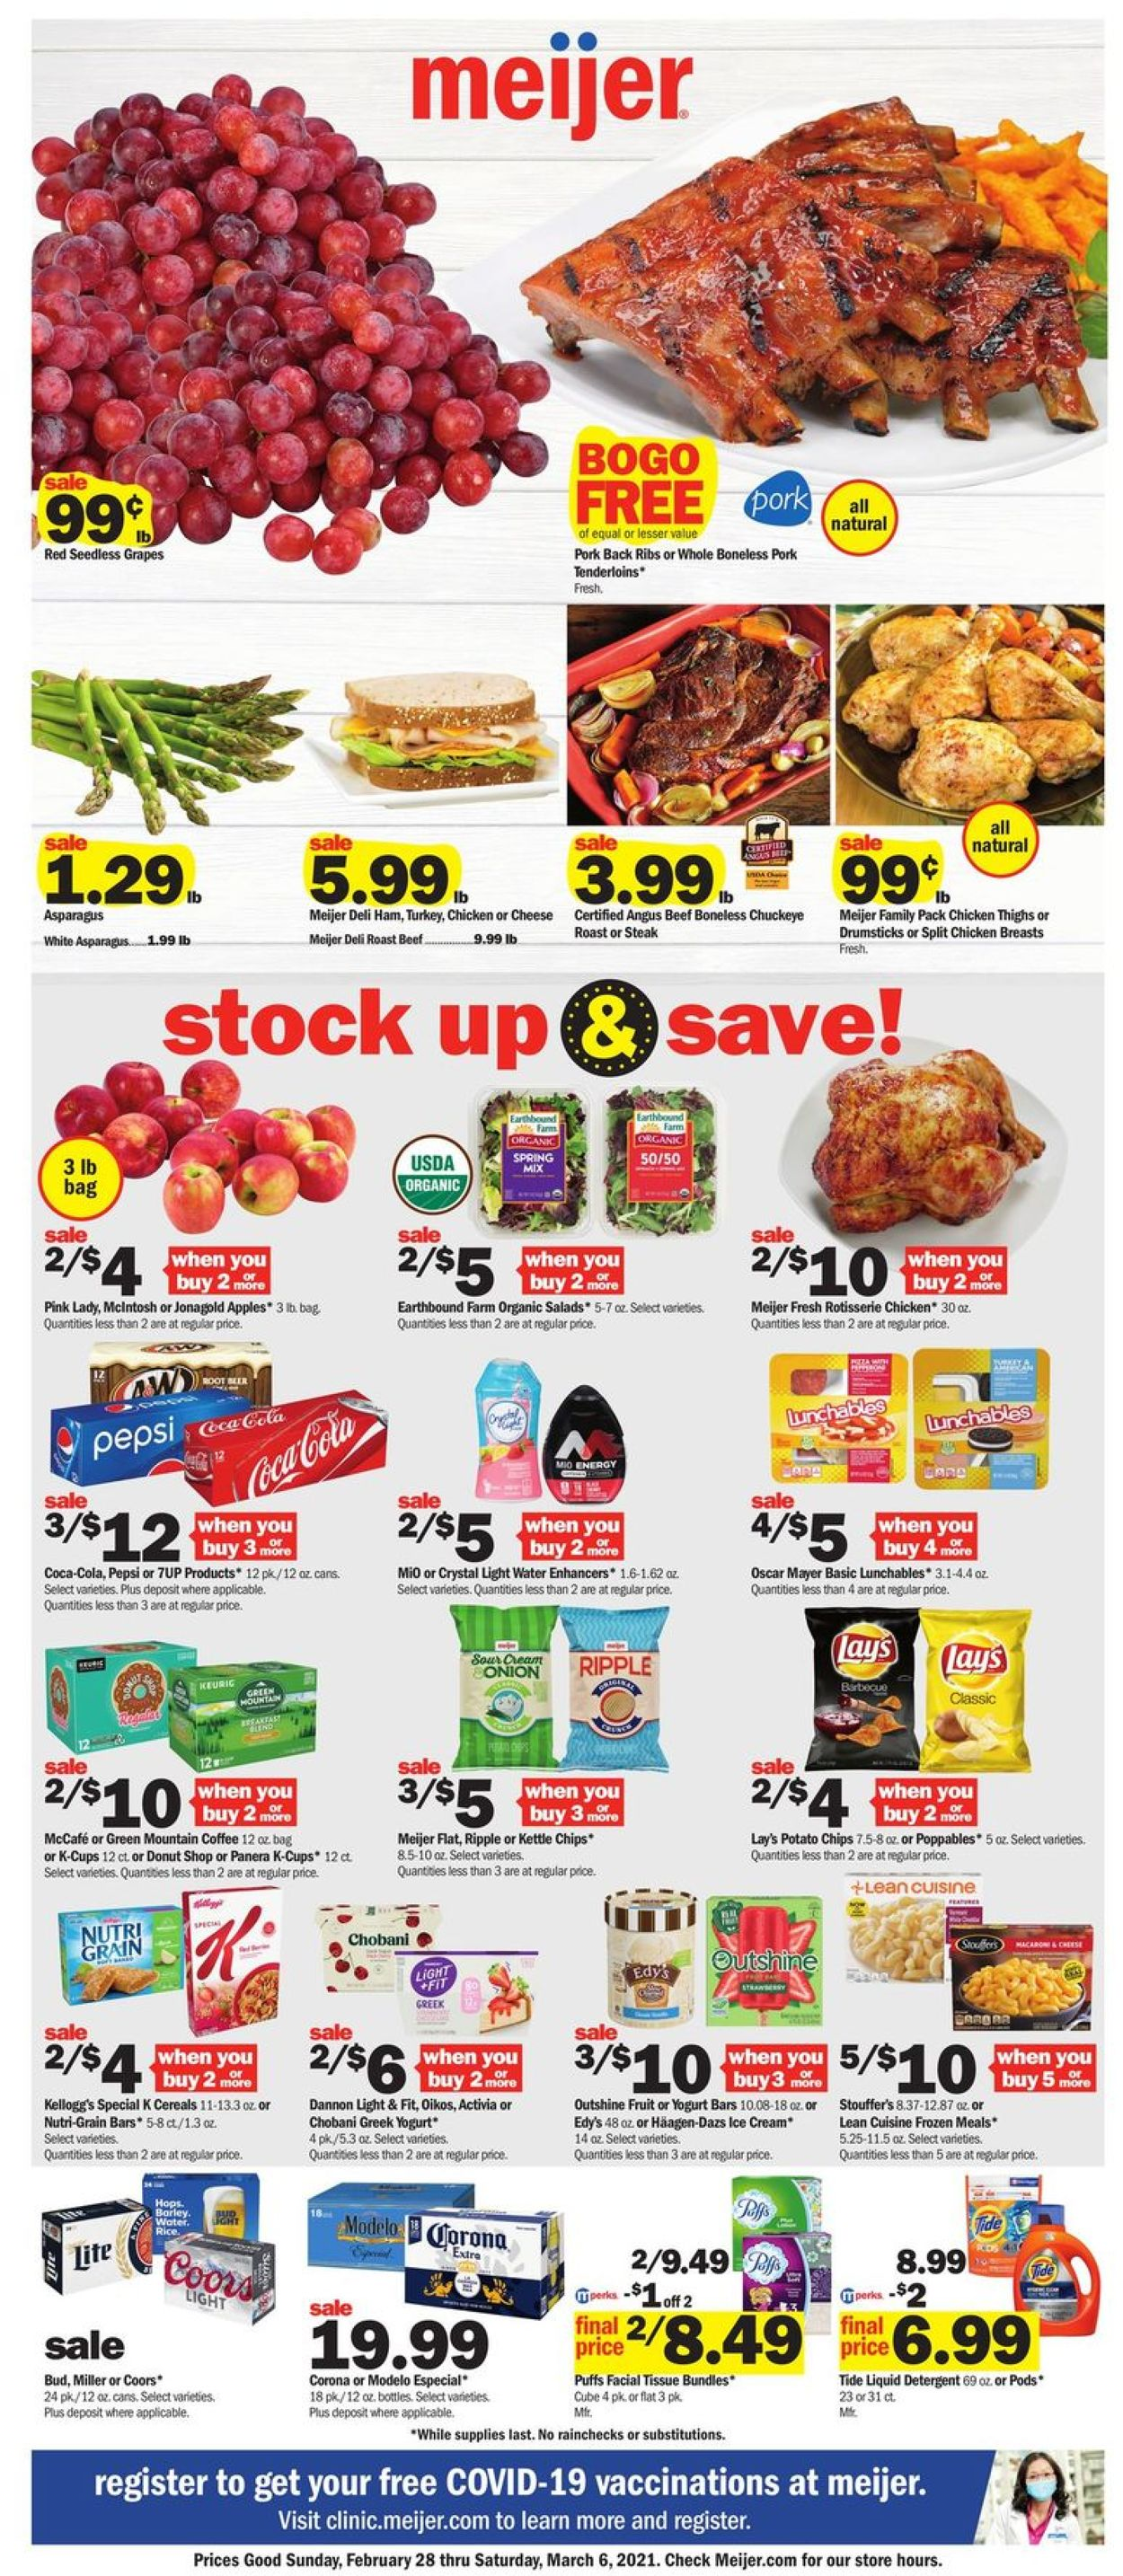 Meijer Weekly Ad Circular - valid 02/28-03/06/2021